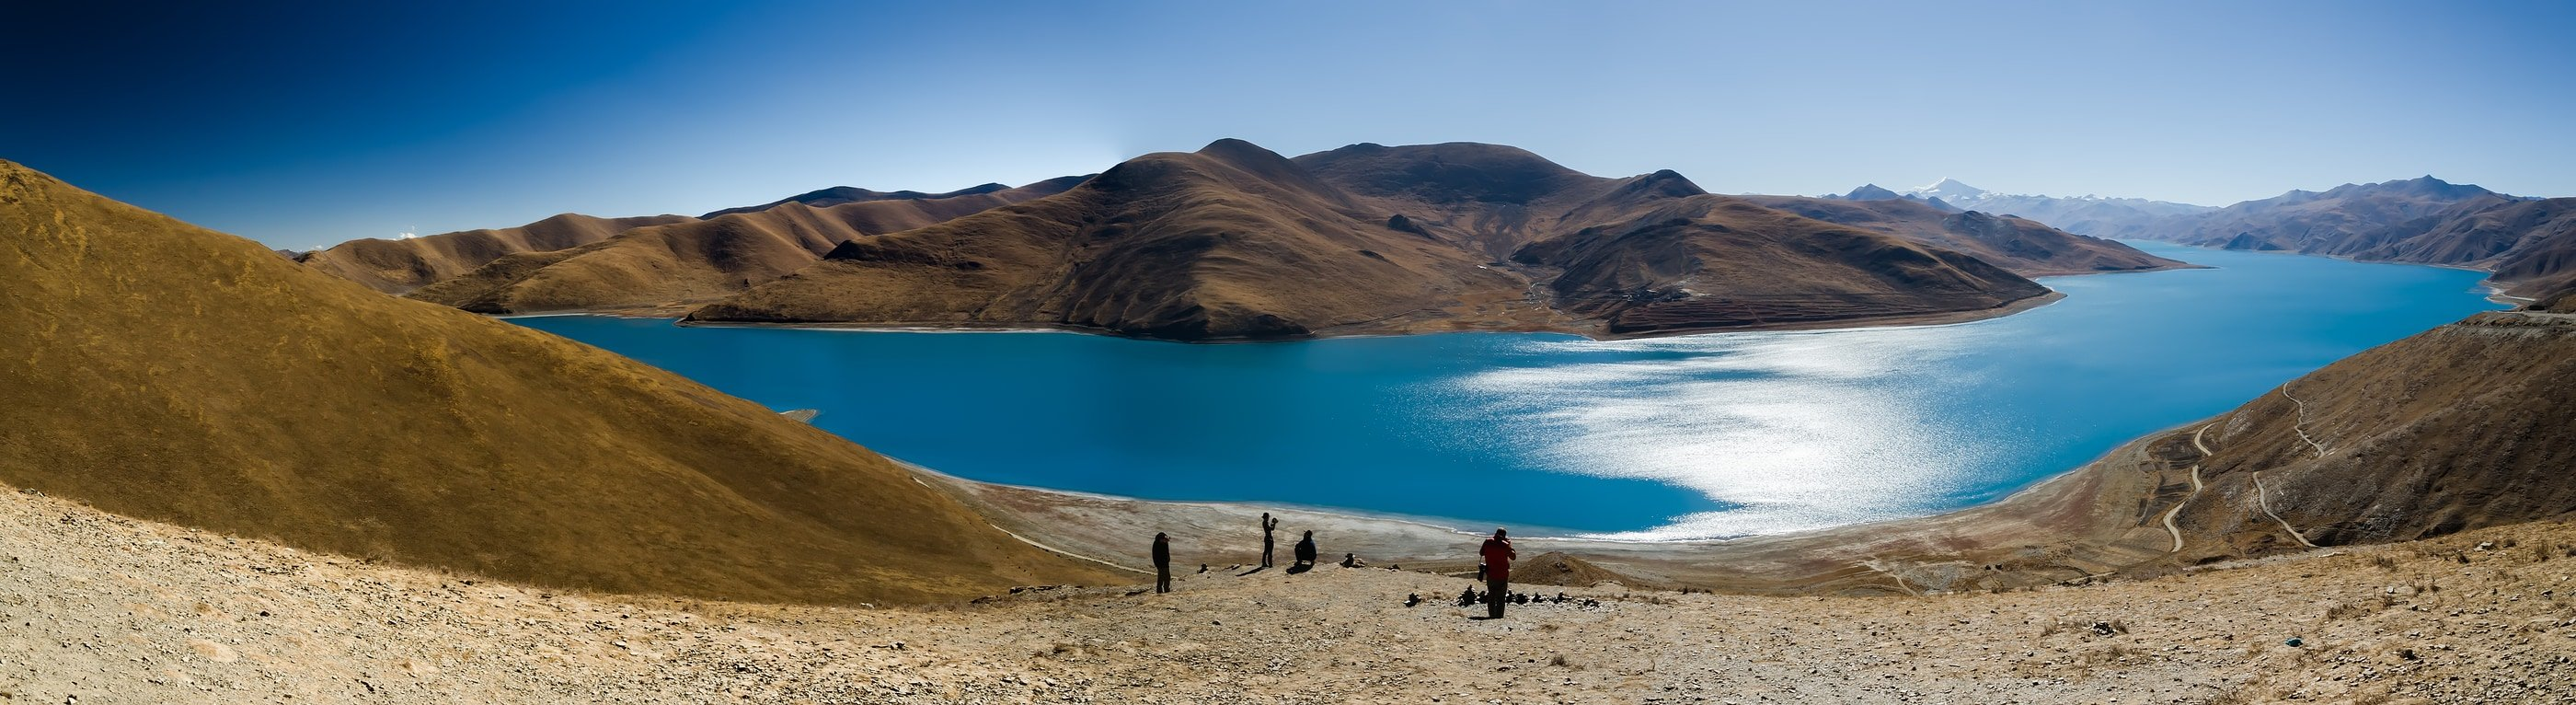 Yamdrok Lake, the sacred lake in Tibet